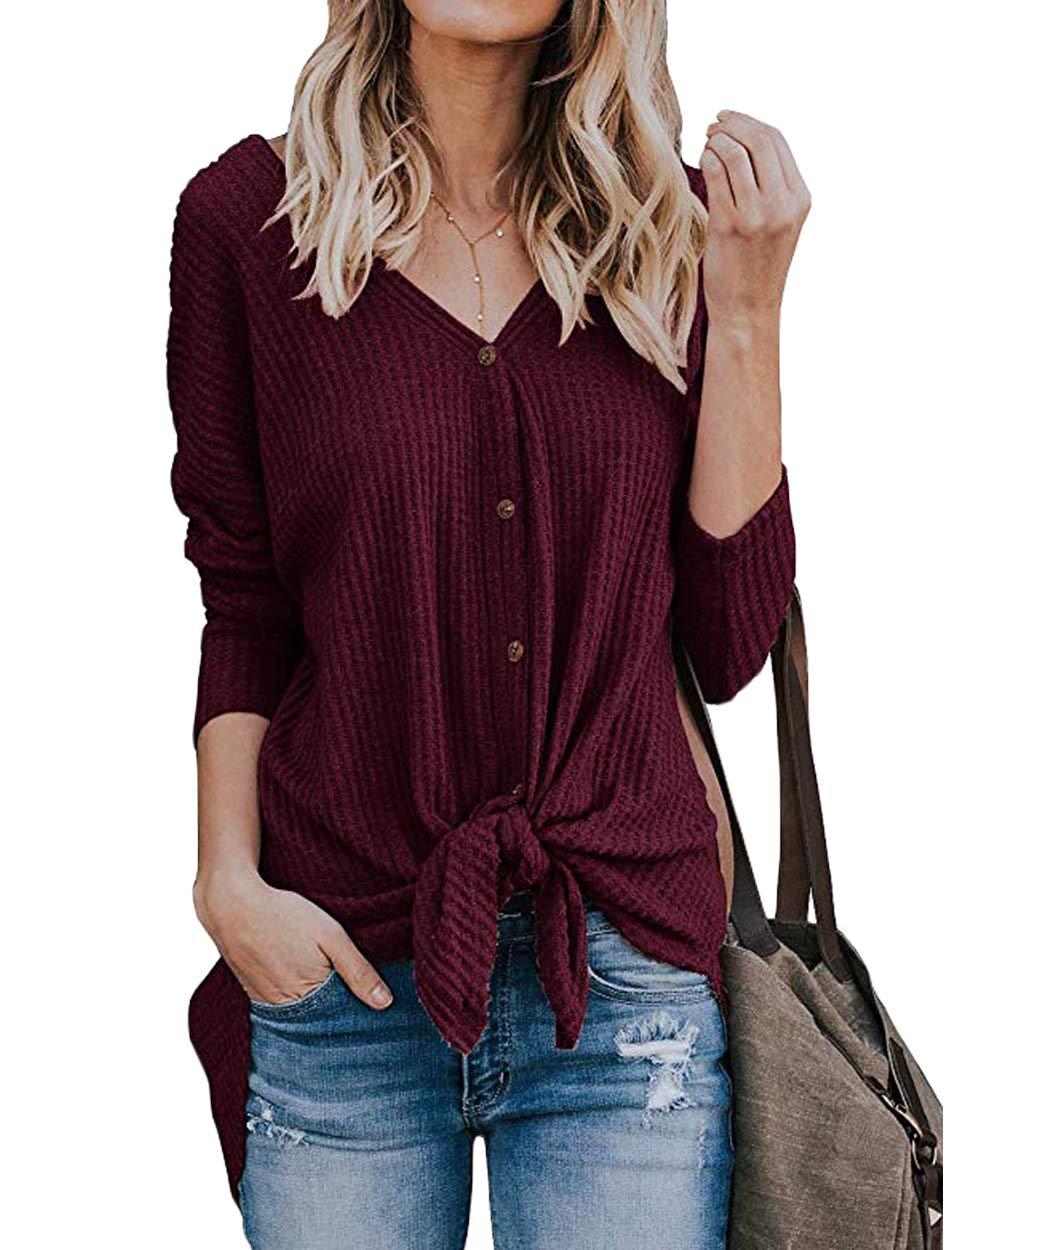 2a0e5415fc5d24 Eanklosco Tie Knot Tops Womens Waffle Knit V Neck Blouse Button Down Long  Sleeve Henley Shirt